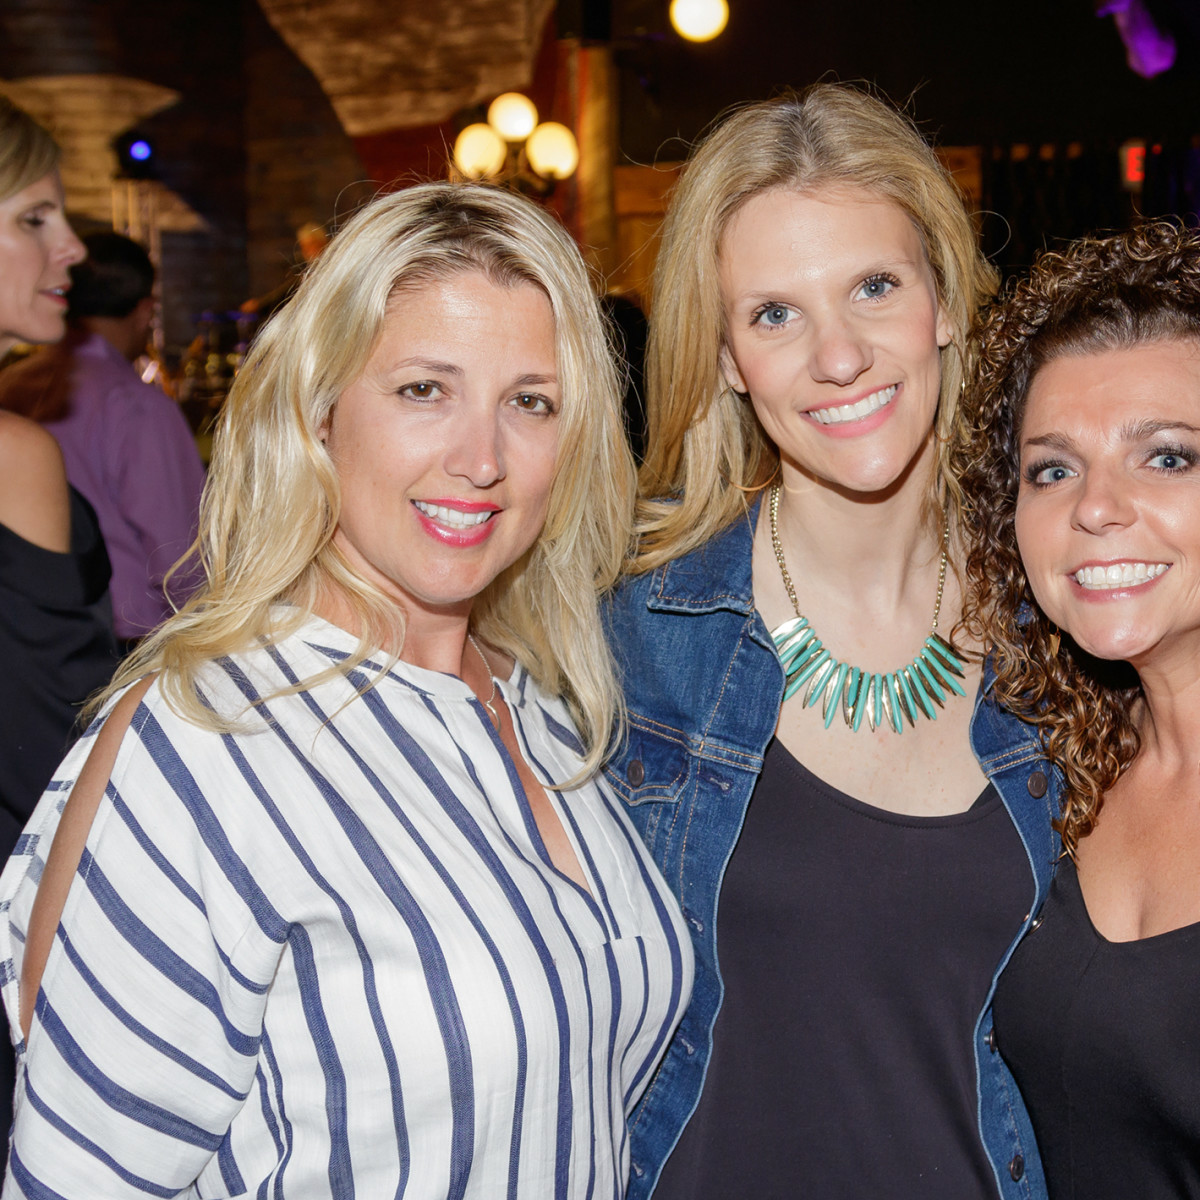 Holly Magnuson, Erin Fulton, Liesel Herrera